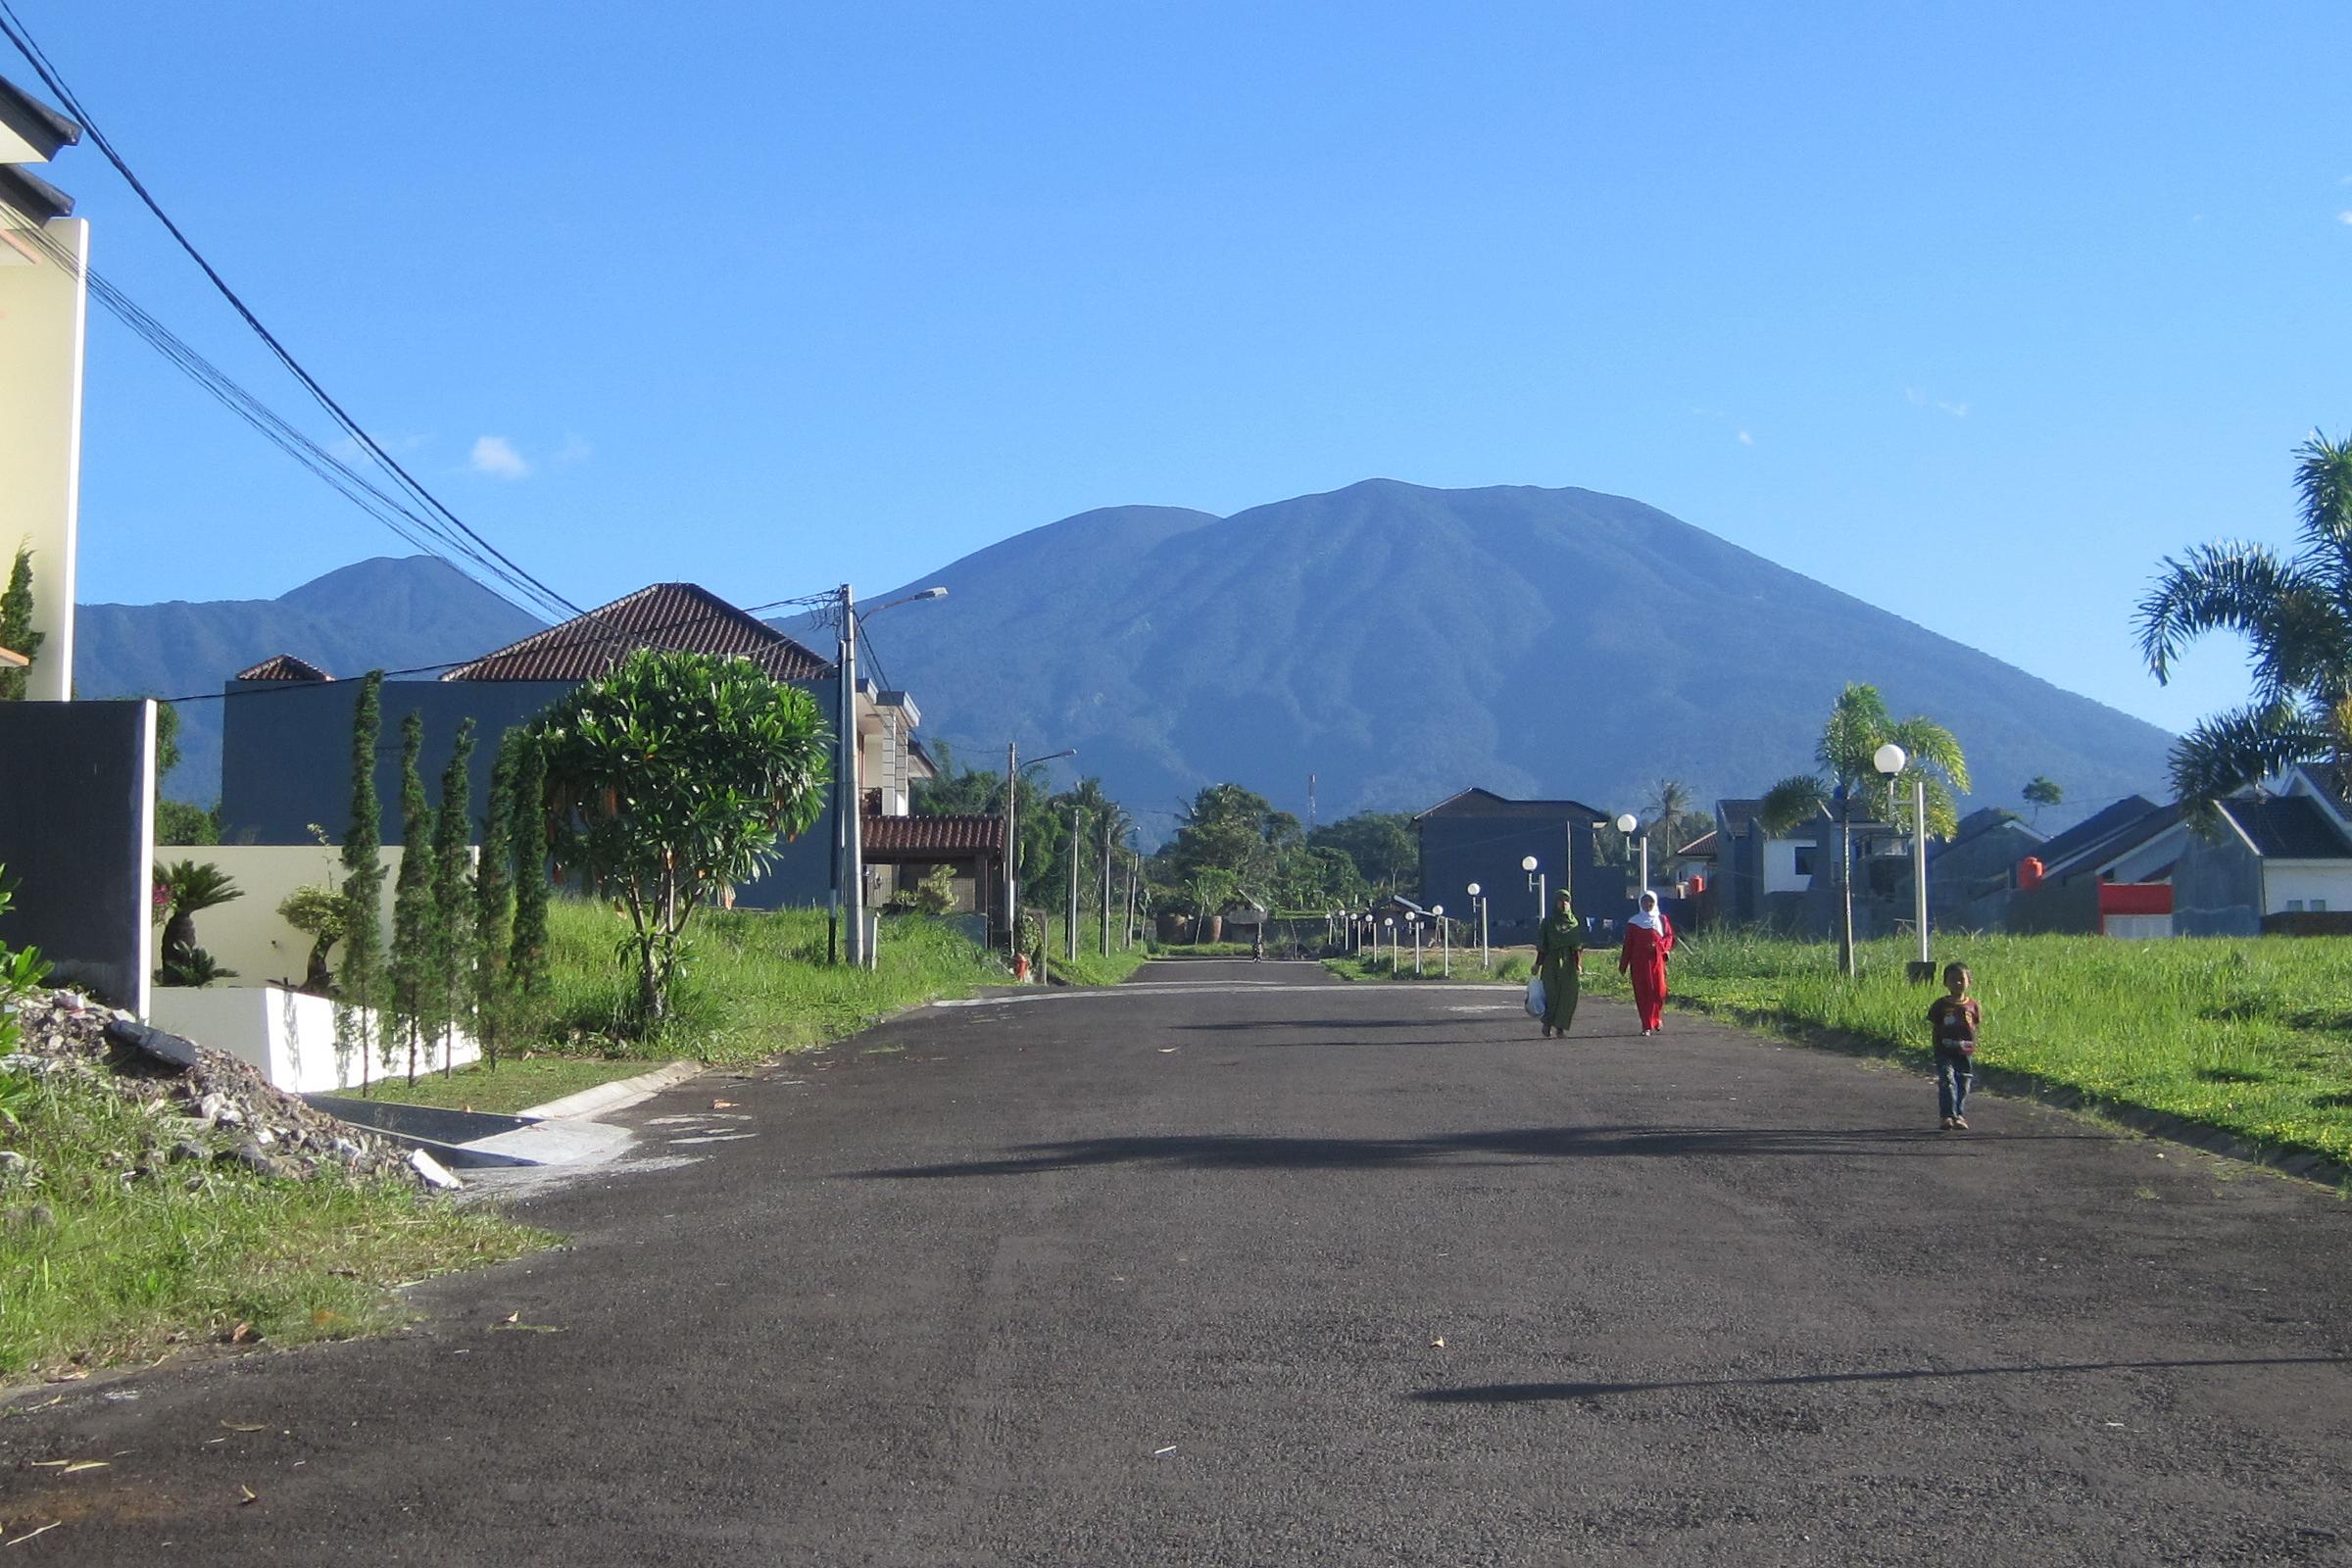 Phawngpui